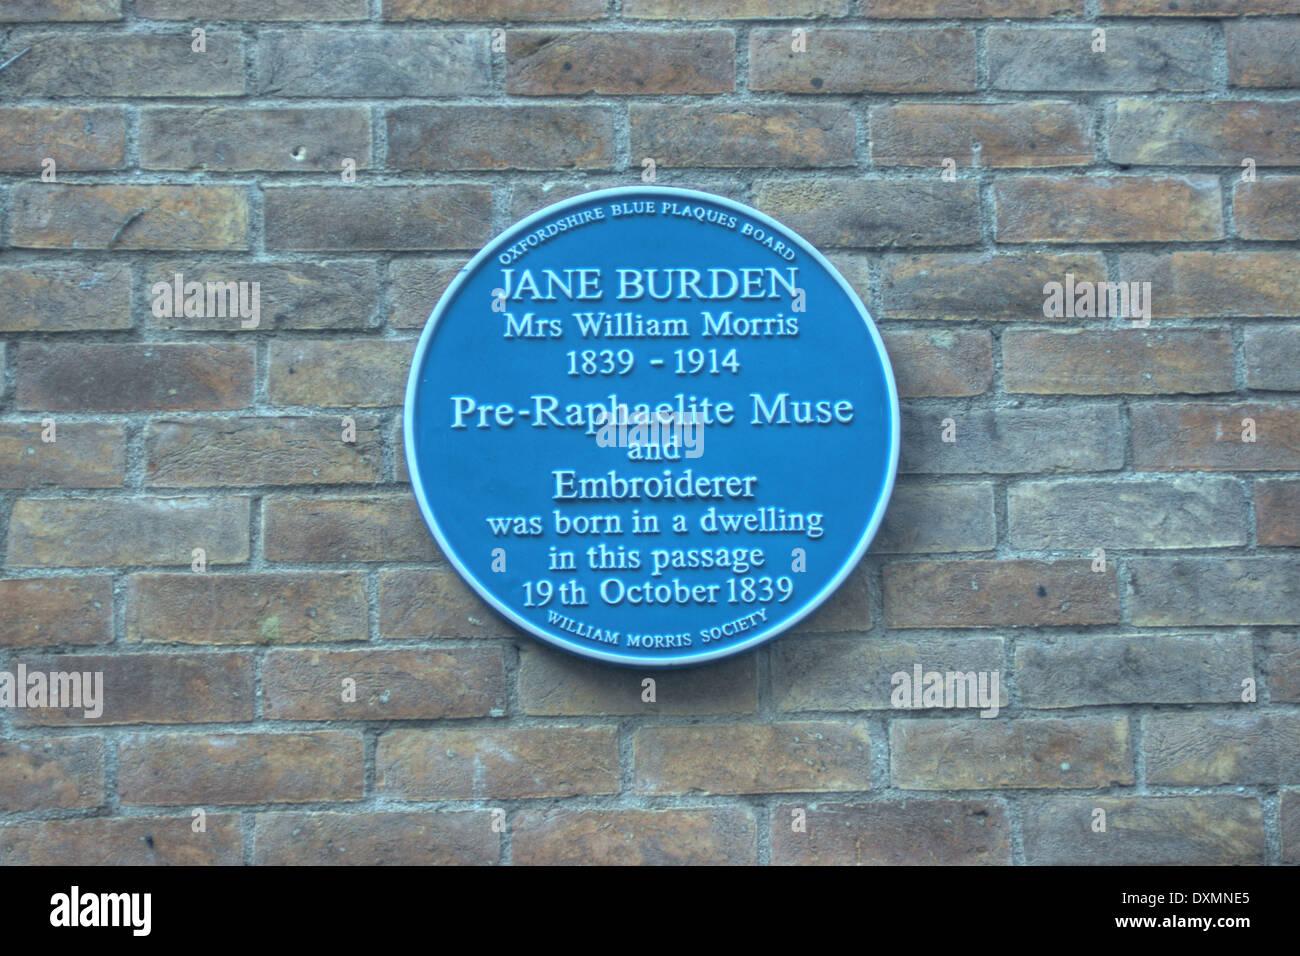 Plaque to Jane Burden, Pre-Raphaelite muse, oxford - Stock Image